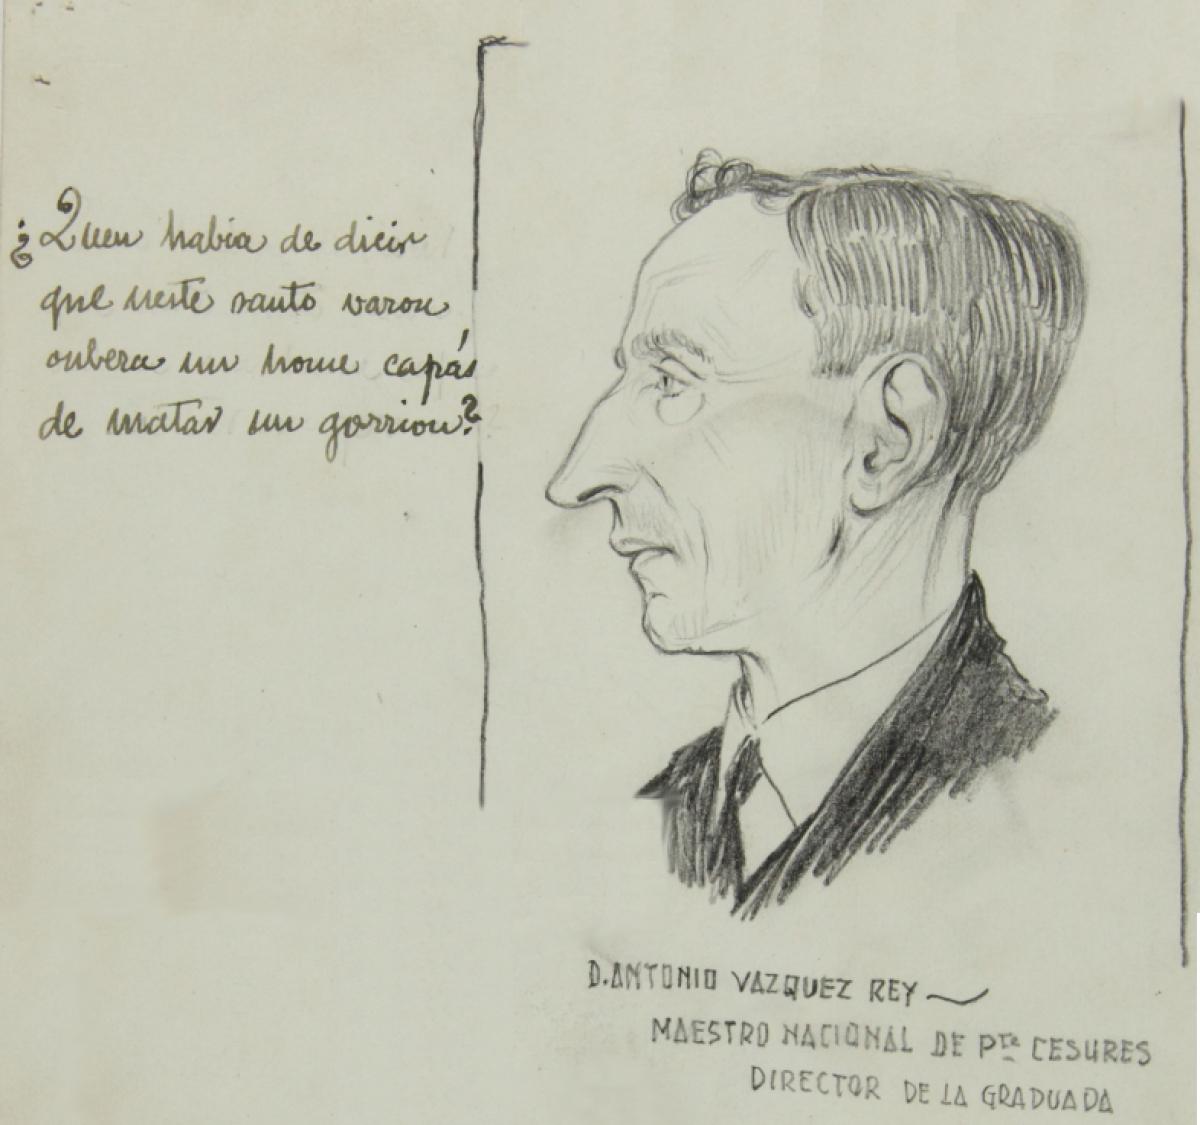 Retrato de Antonio Vázquez Rei realizado por Camilo Díaz Baliño cando estiveron no cárcere de Santiago de Compostela